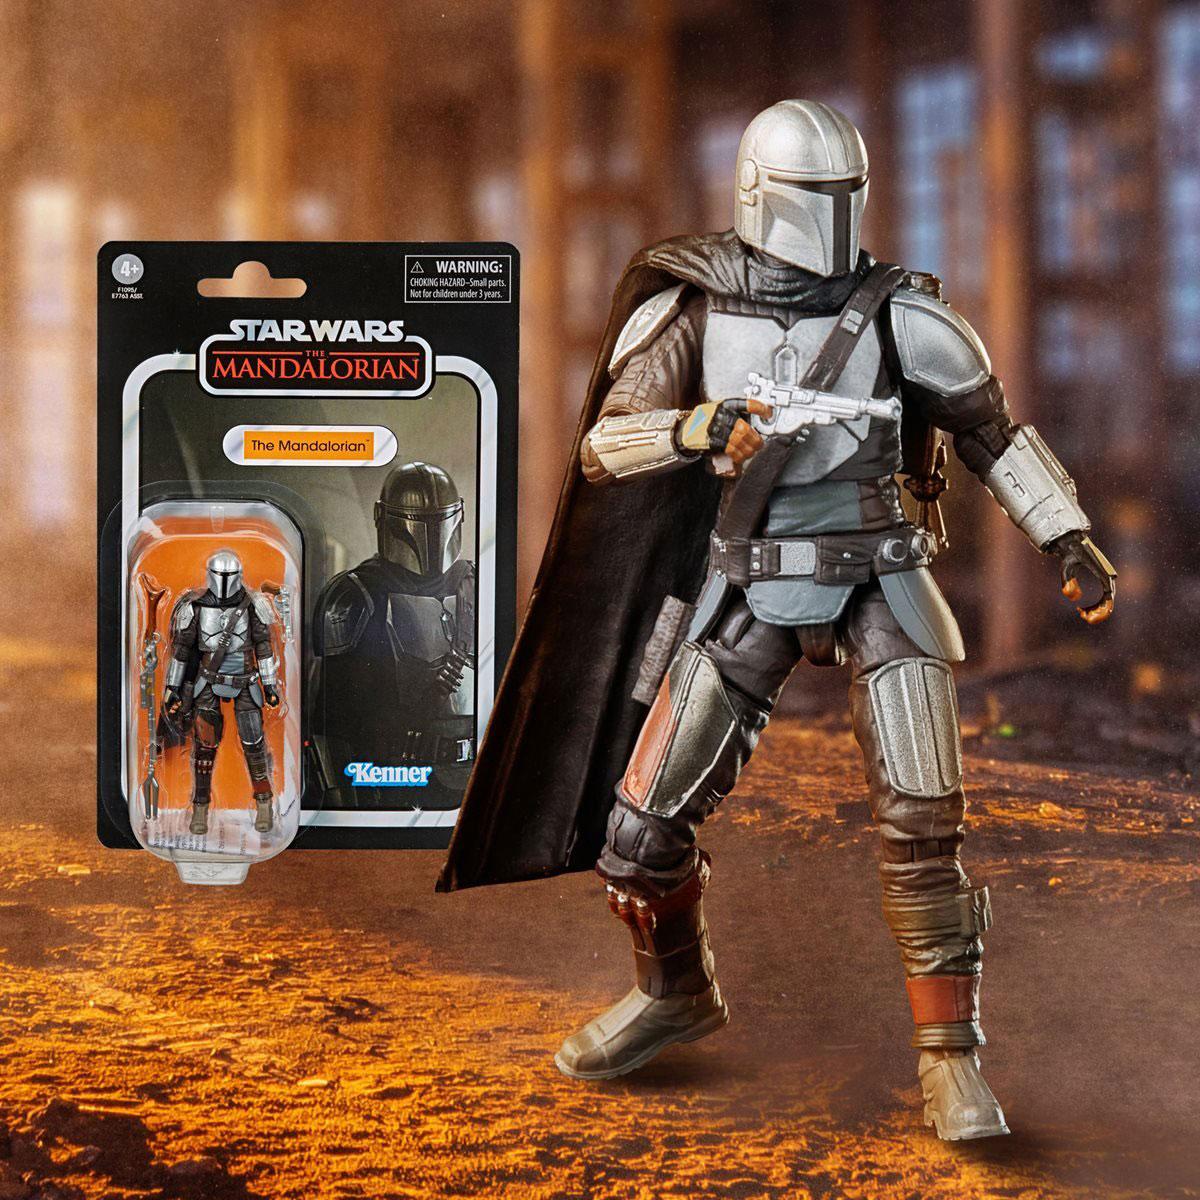 star-wars-vintage-collection-mandalorian-in-beskar-armor-action-figure-1